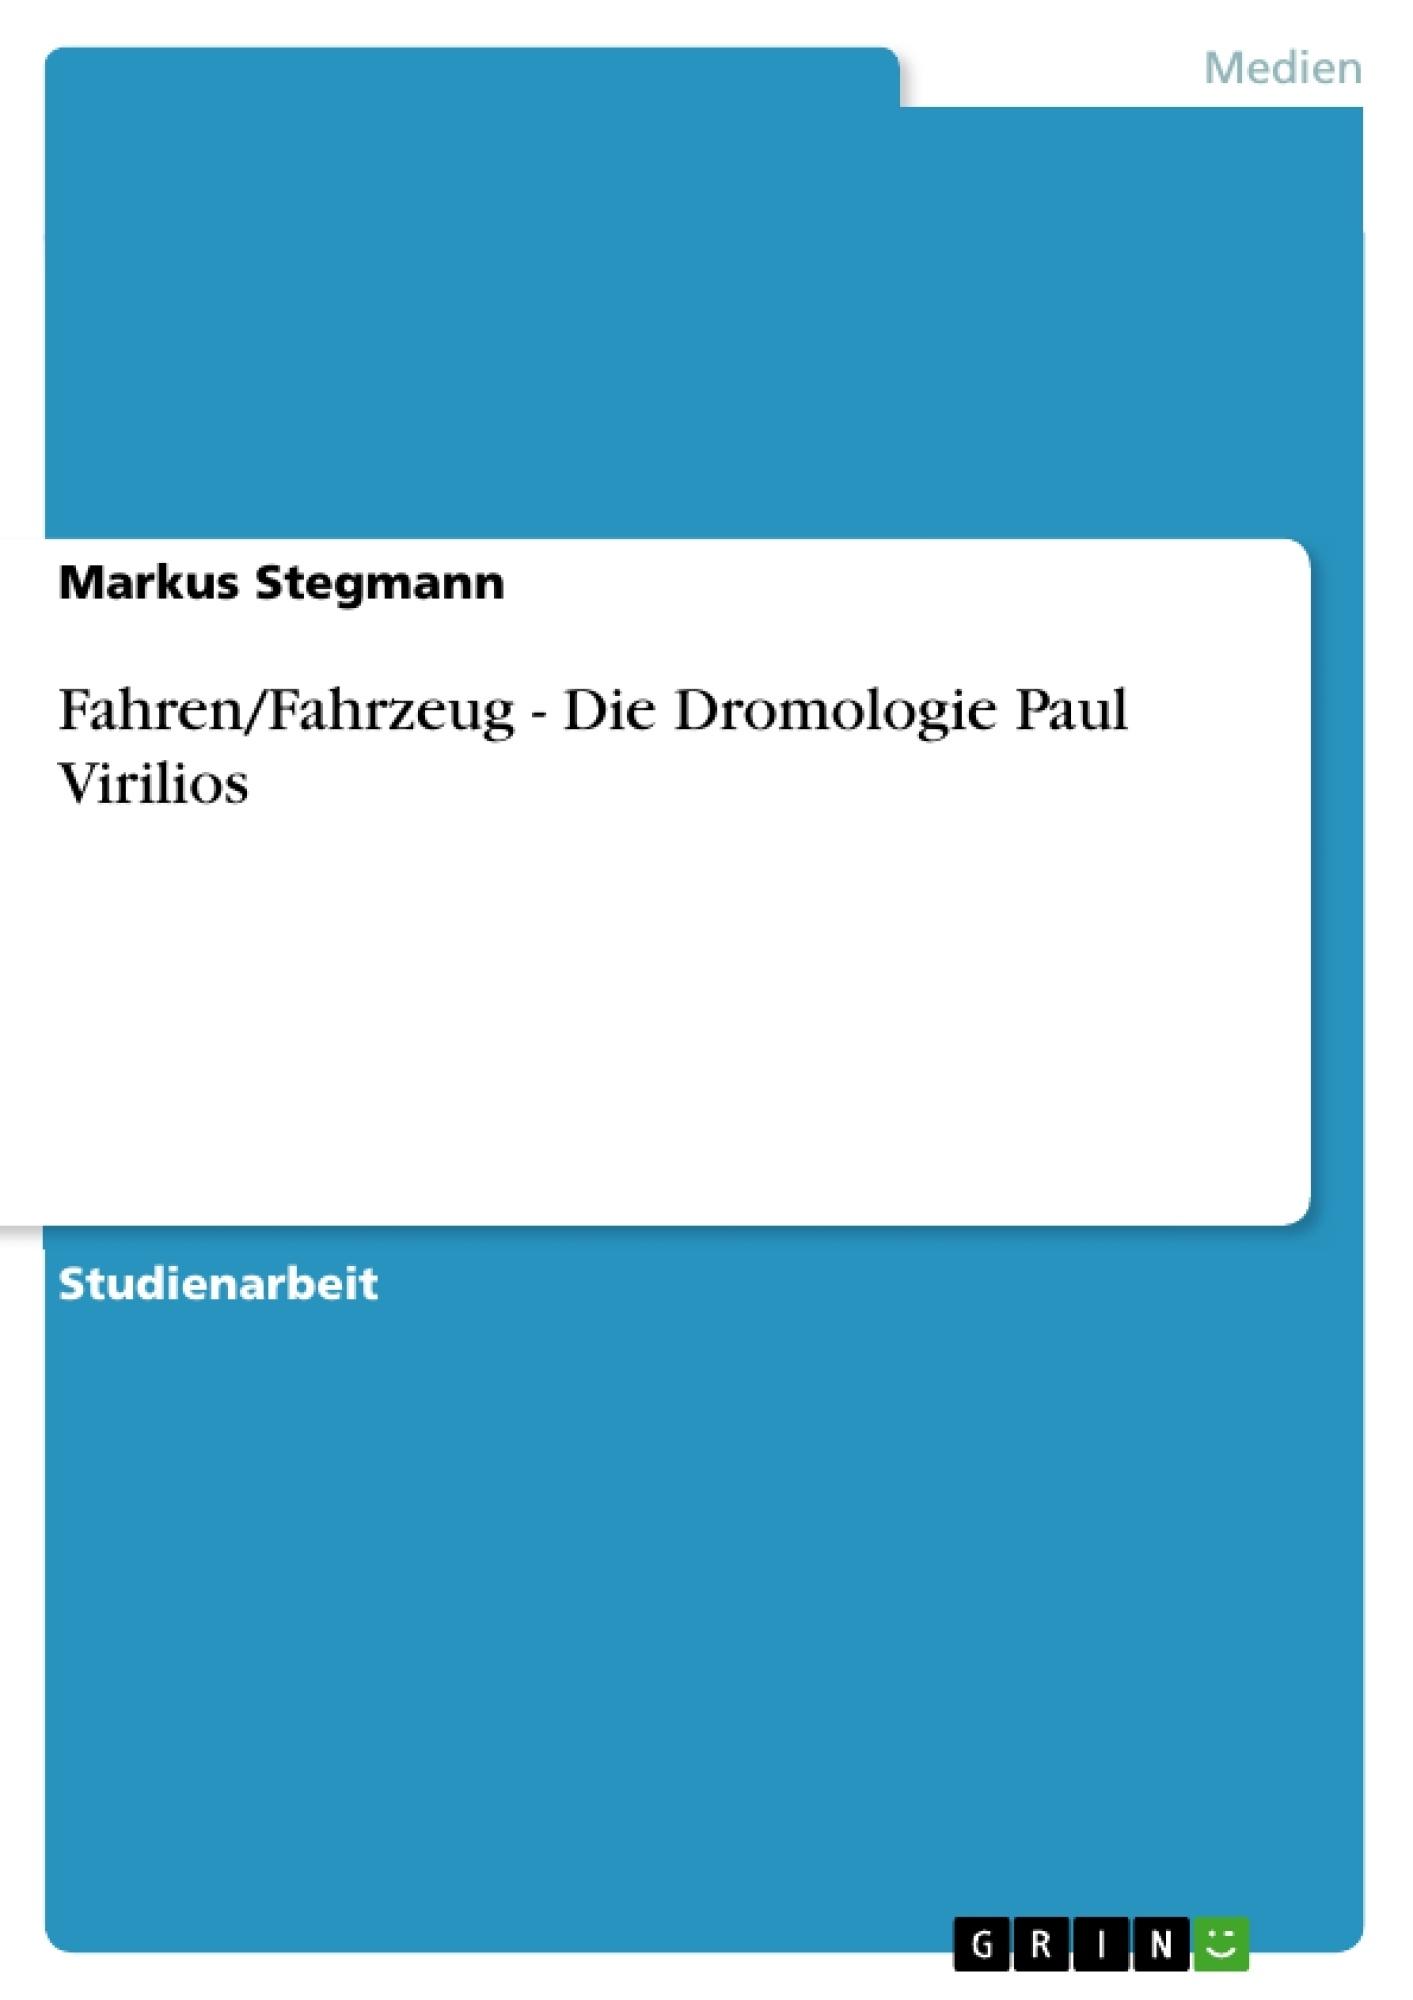 Titel: Fahren/Fahrzeug - Die Dromologie Paul Virilios